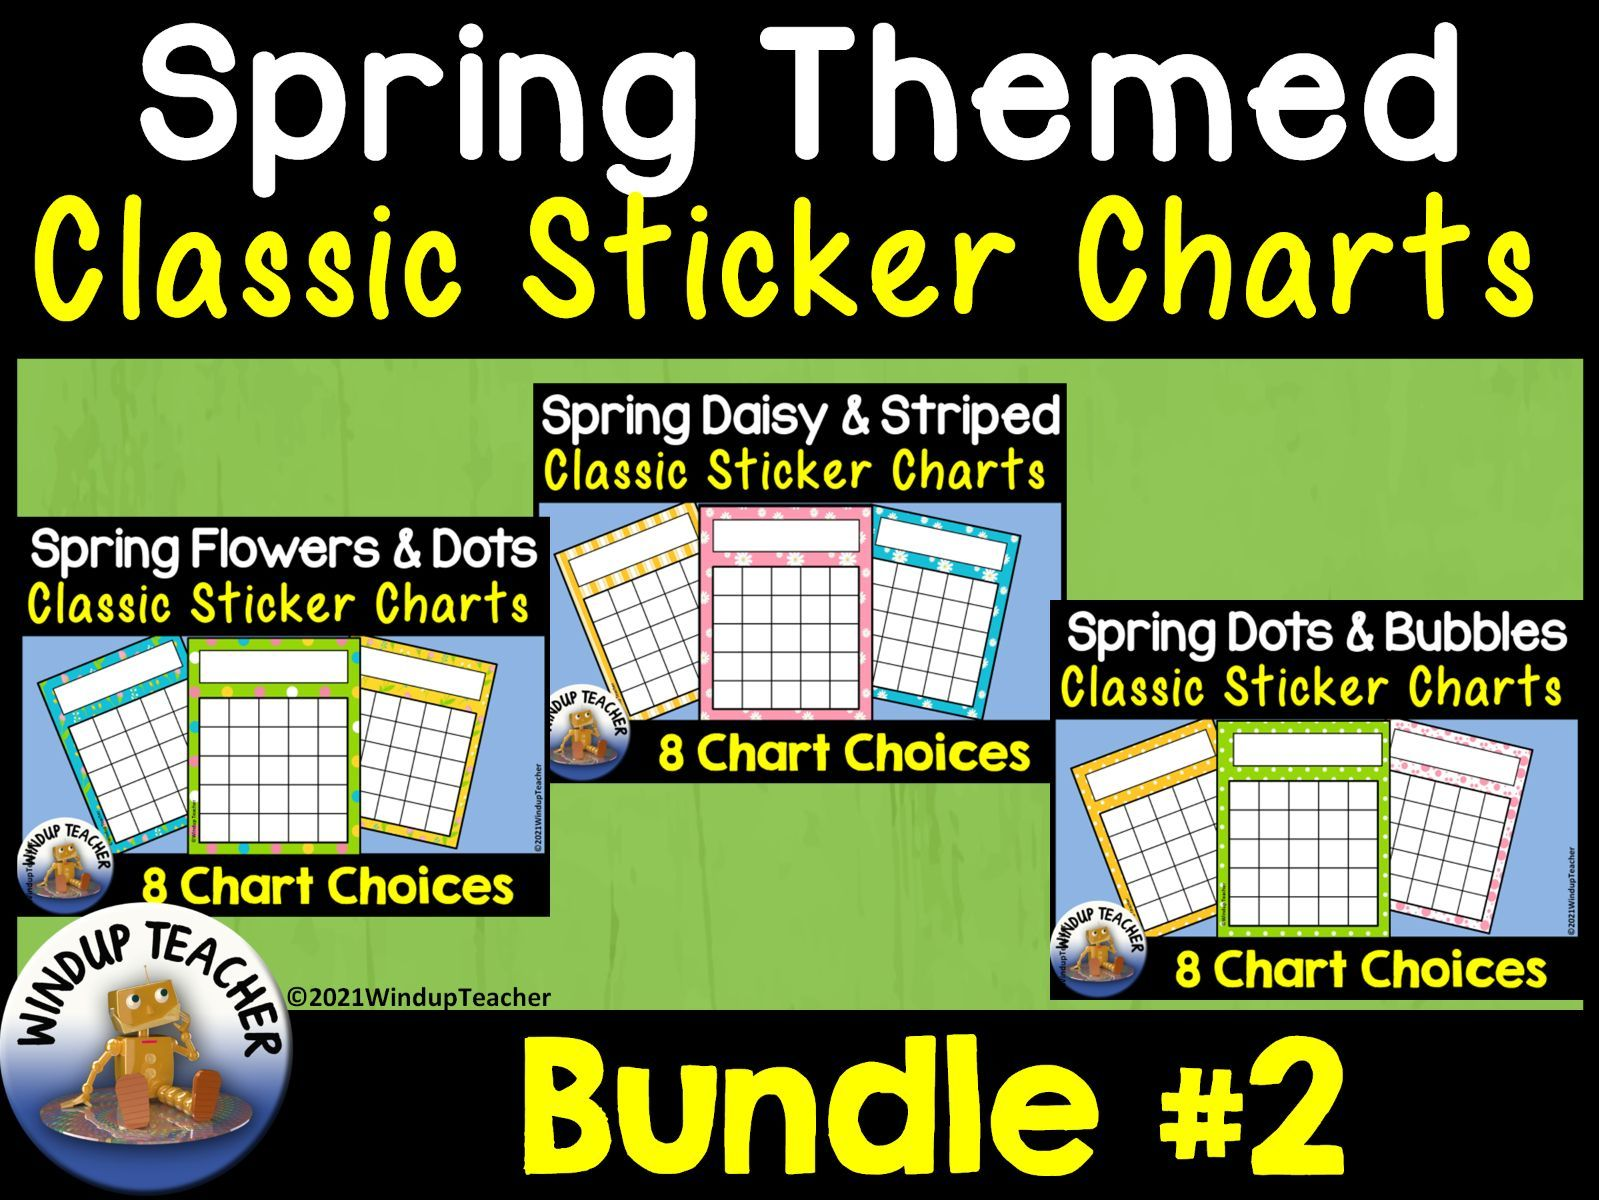 Spring Sticker Charts CLASSIC LINE BUNDLE #2